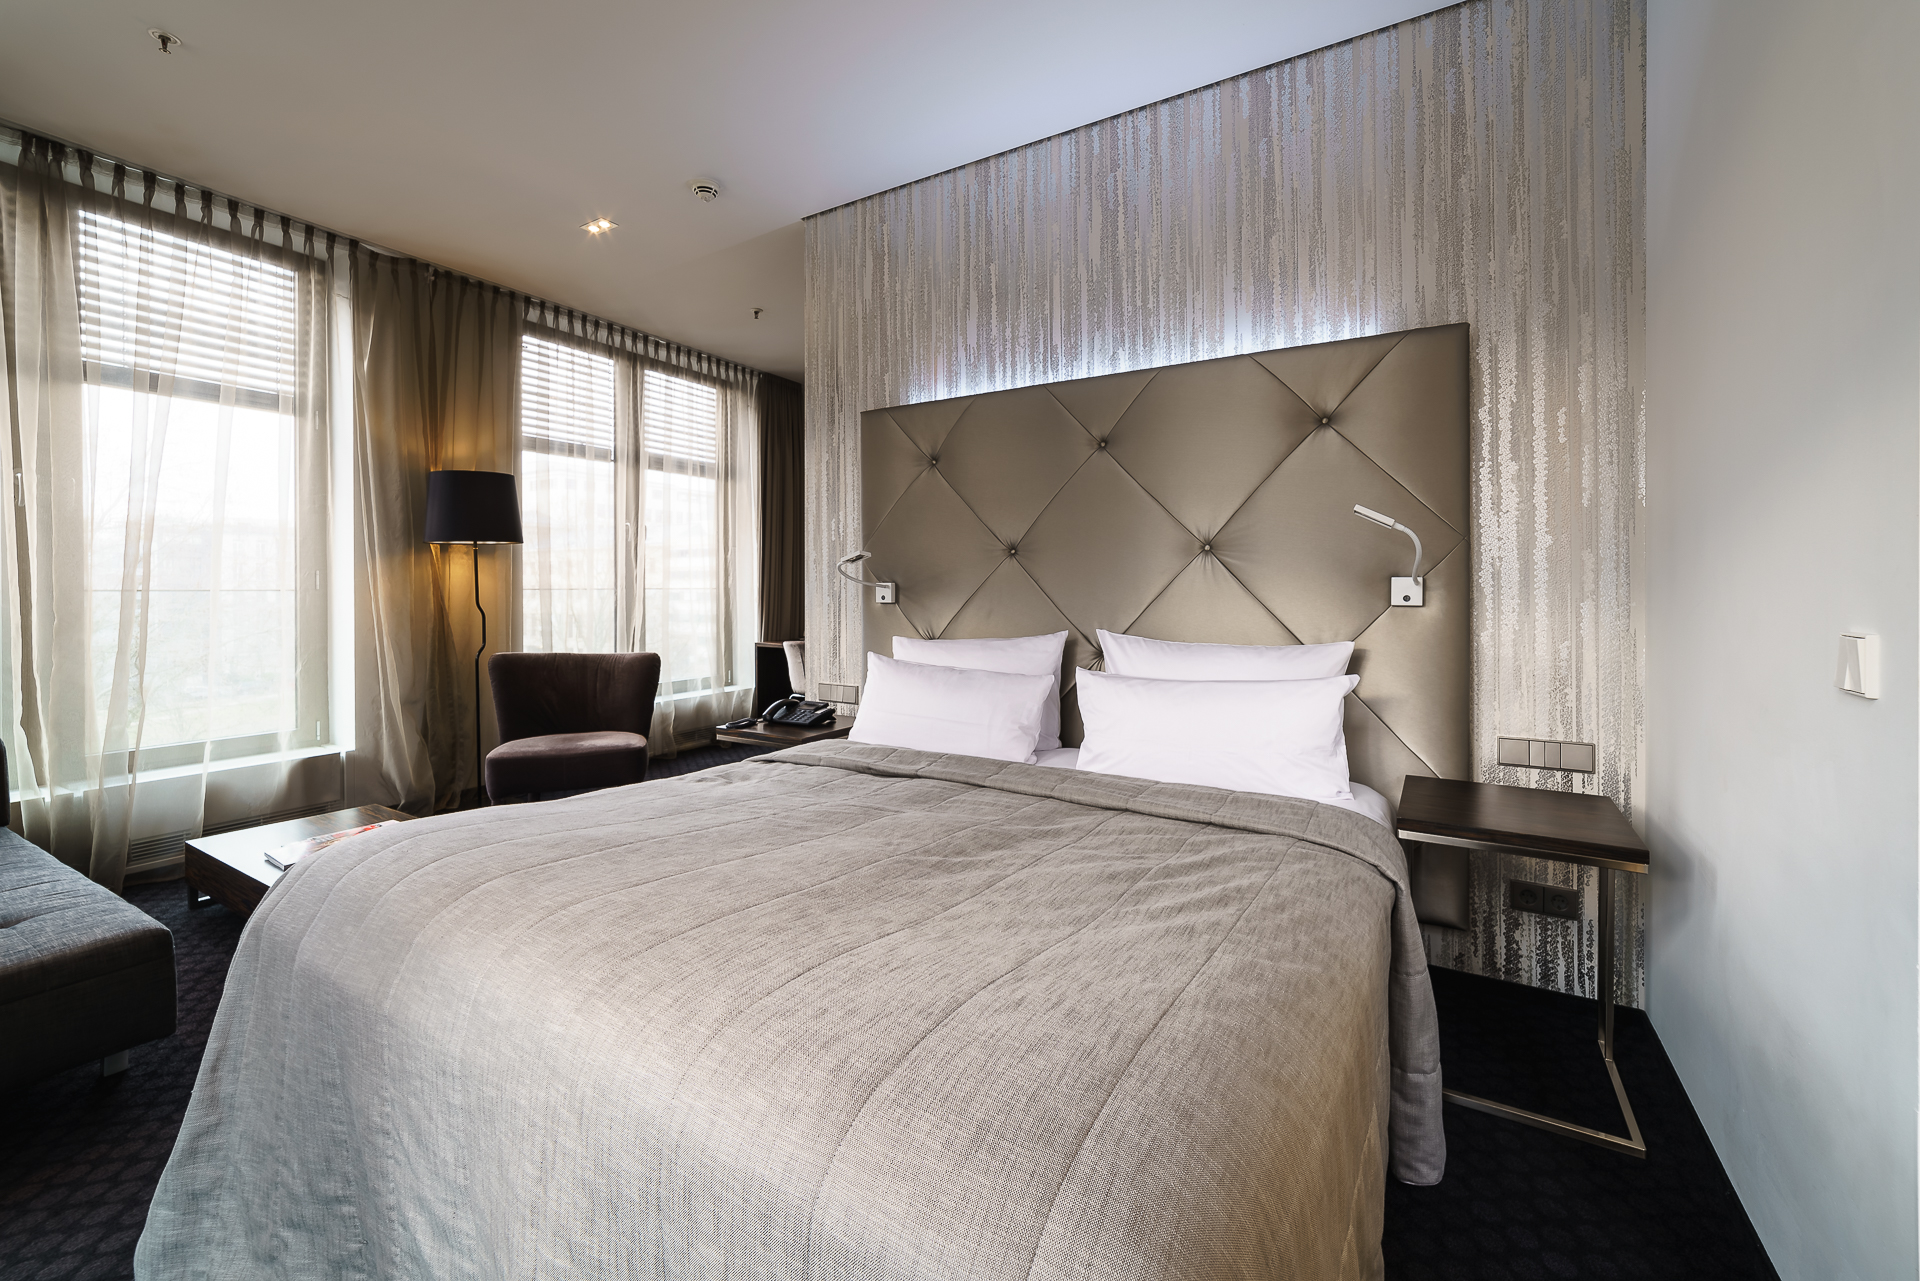 Design-hotel-Cosmo-Berlin-Mitte